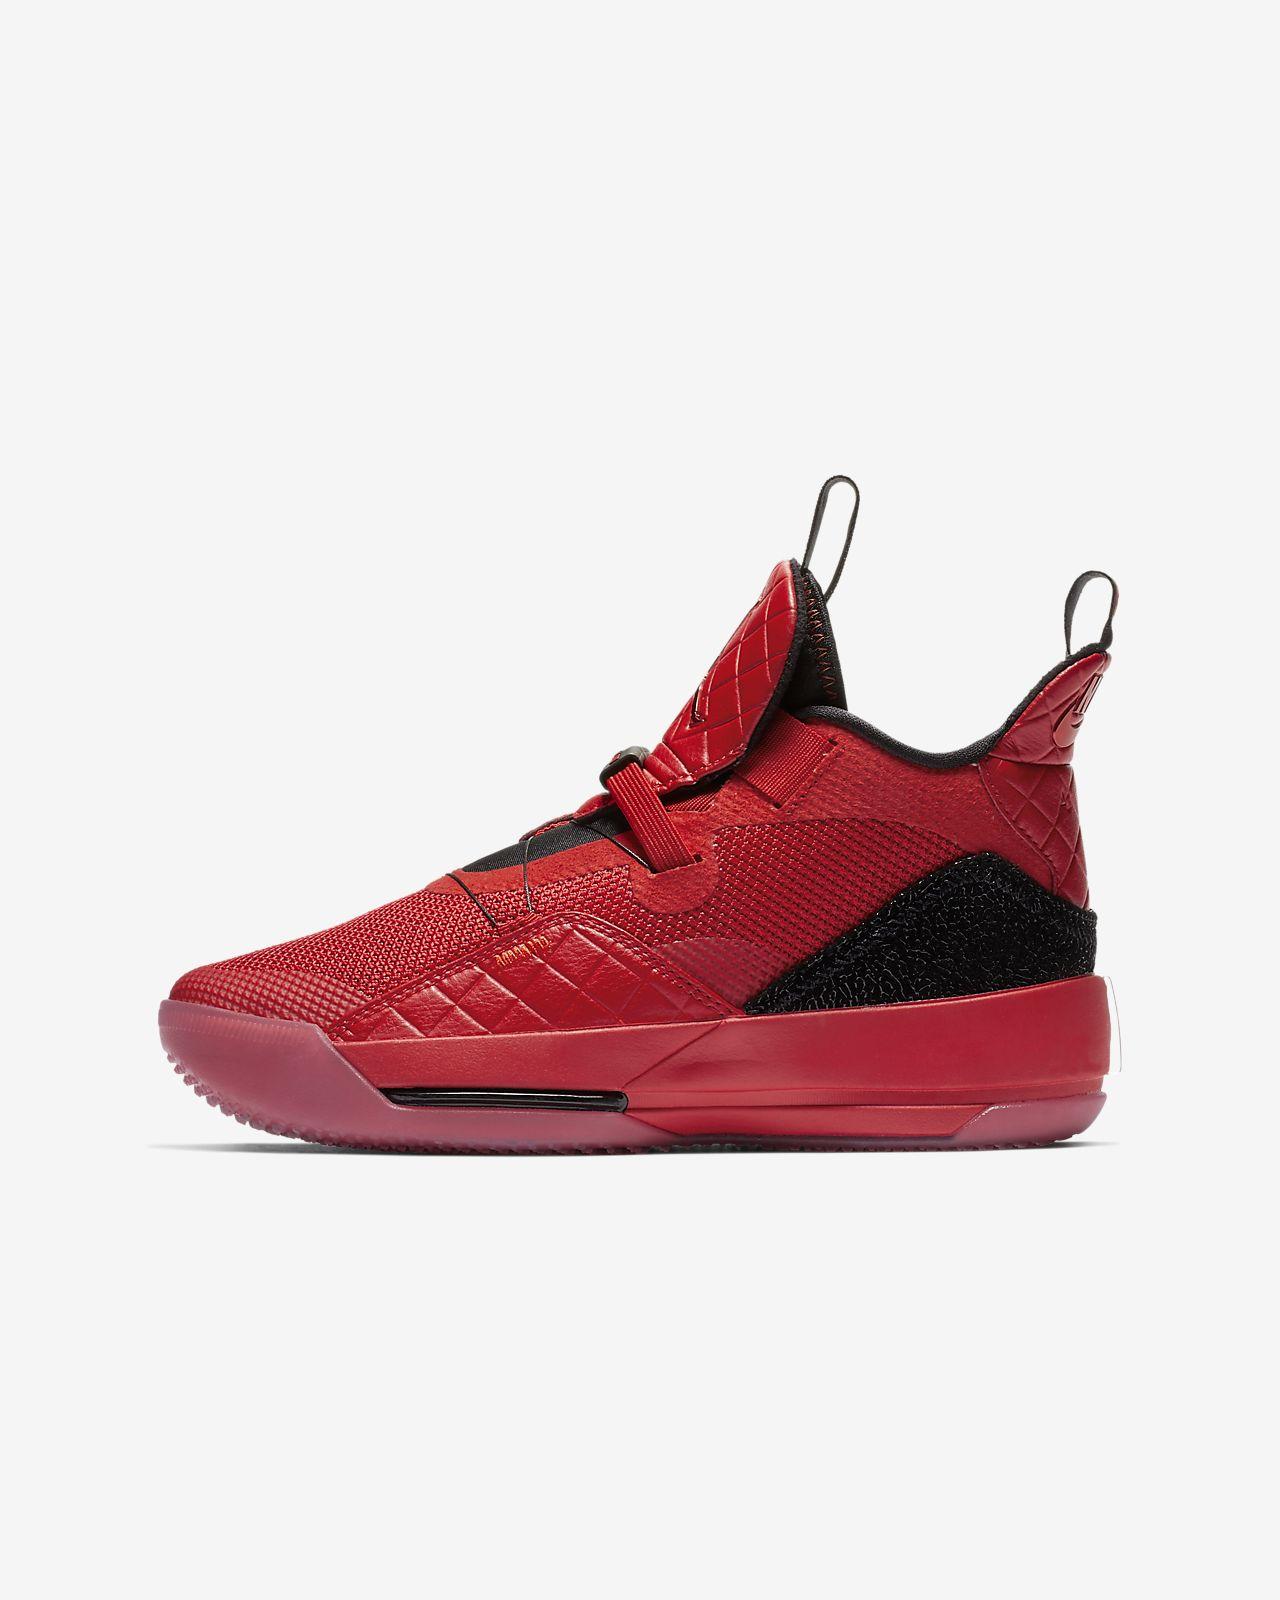 Air Jordan XXXIII Older Kids' Basketball Shoe